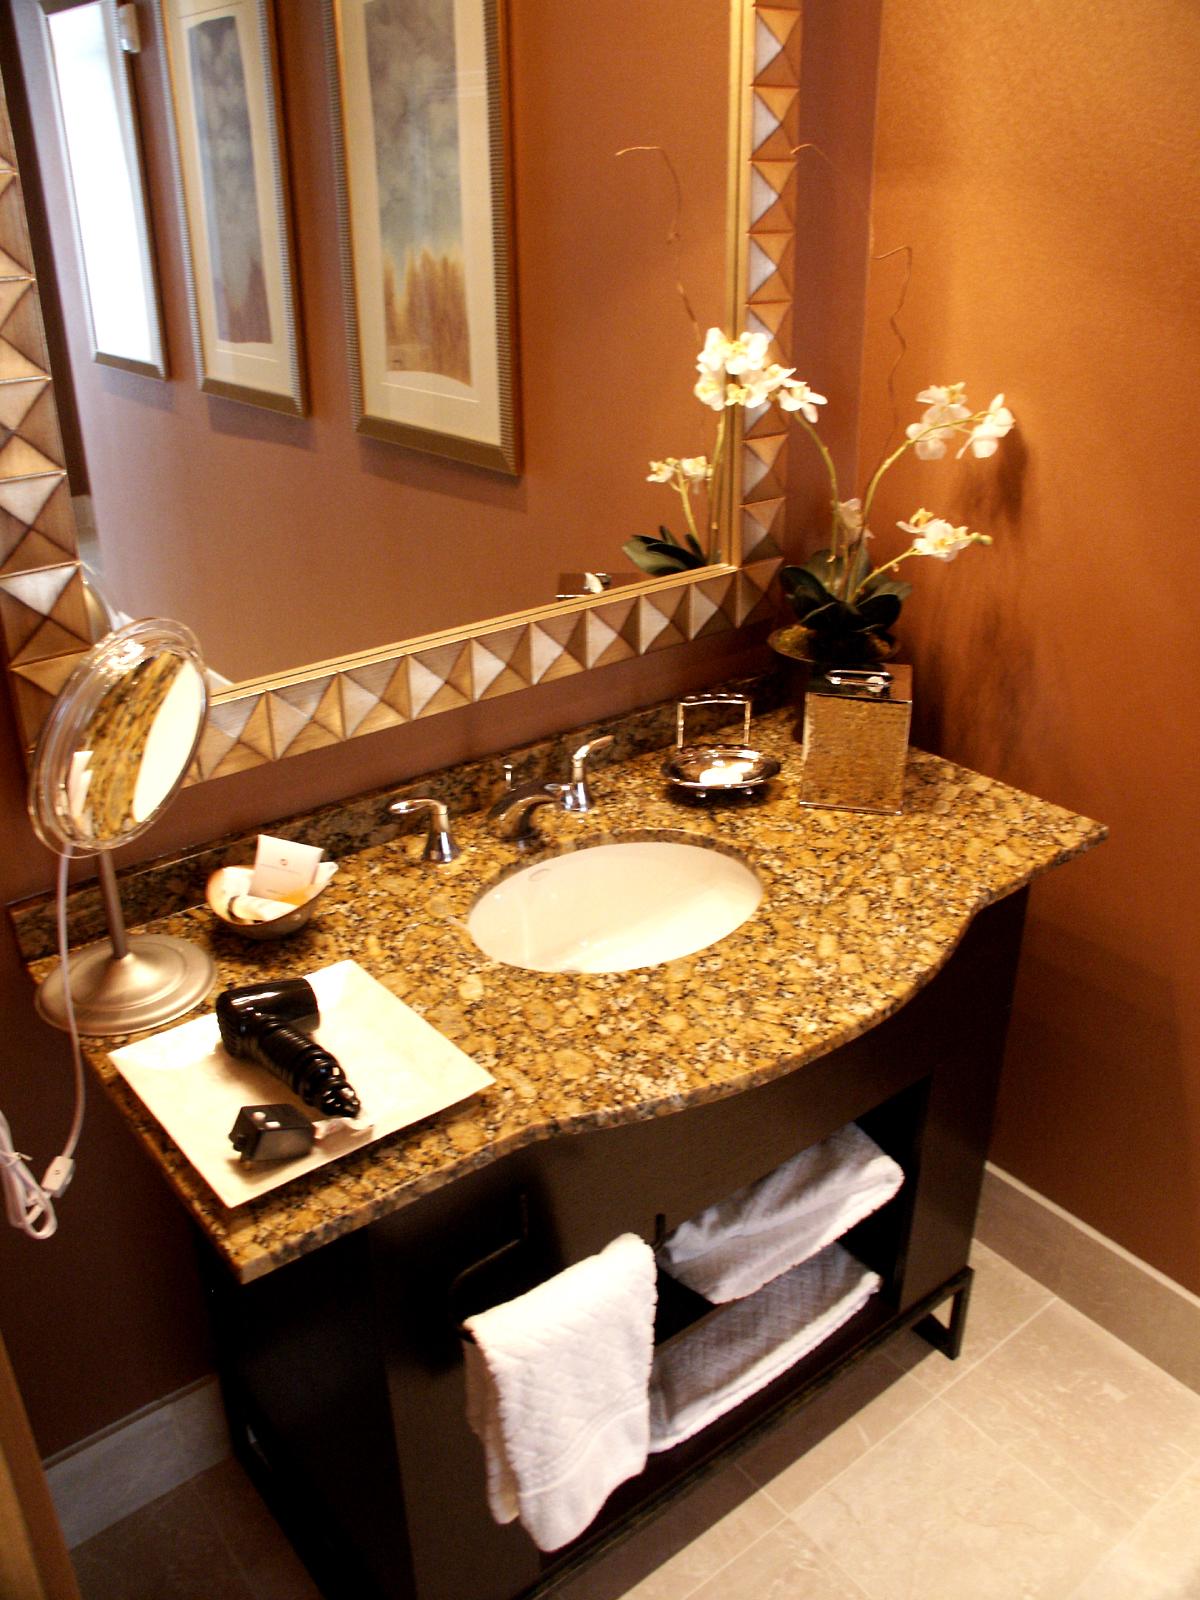 intercontinent Gorgeous Bathroom Decor to make your ... on Beautiful Bathroom Ideas  id=87373